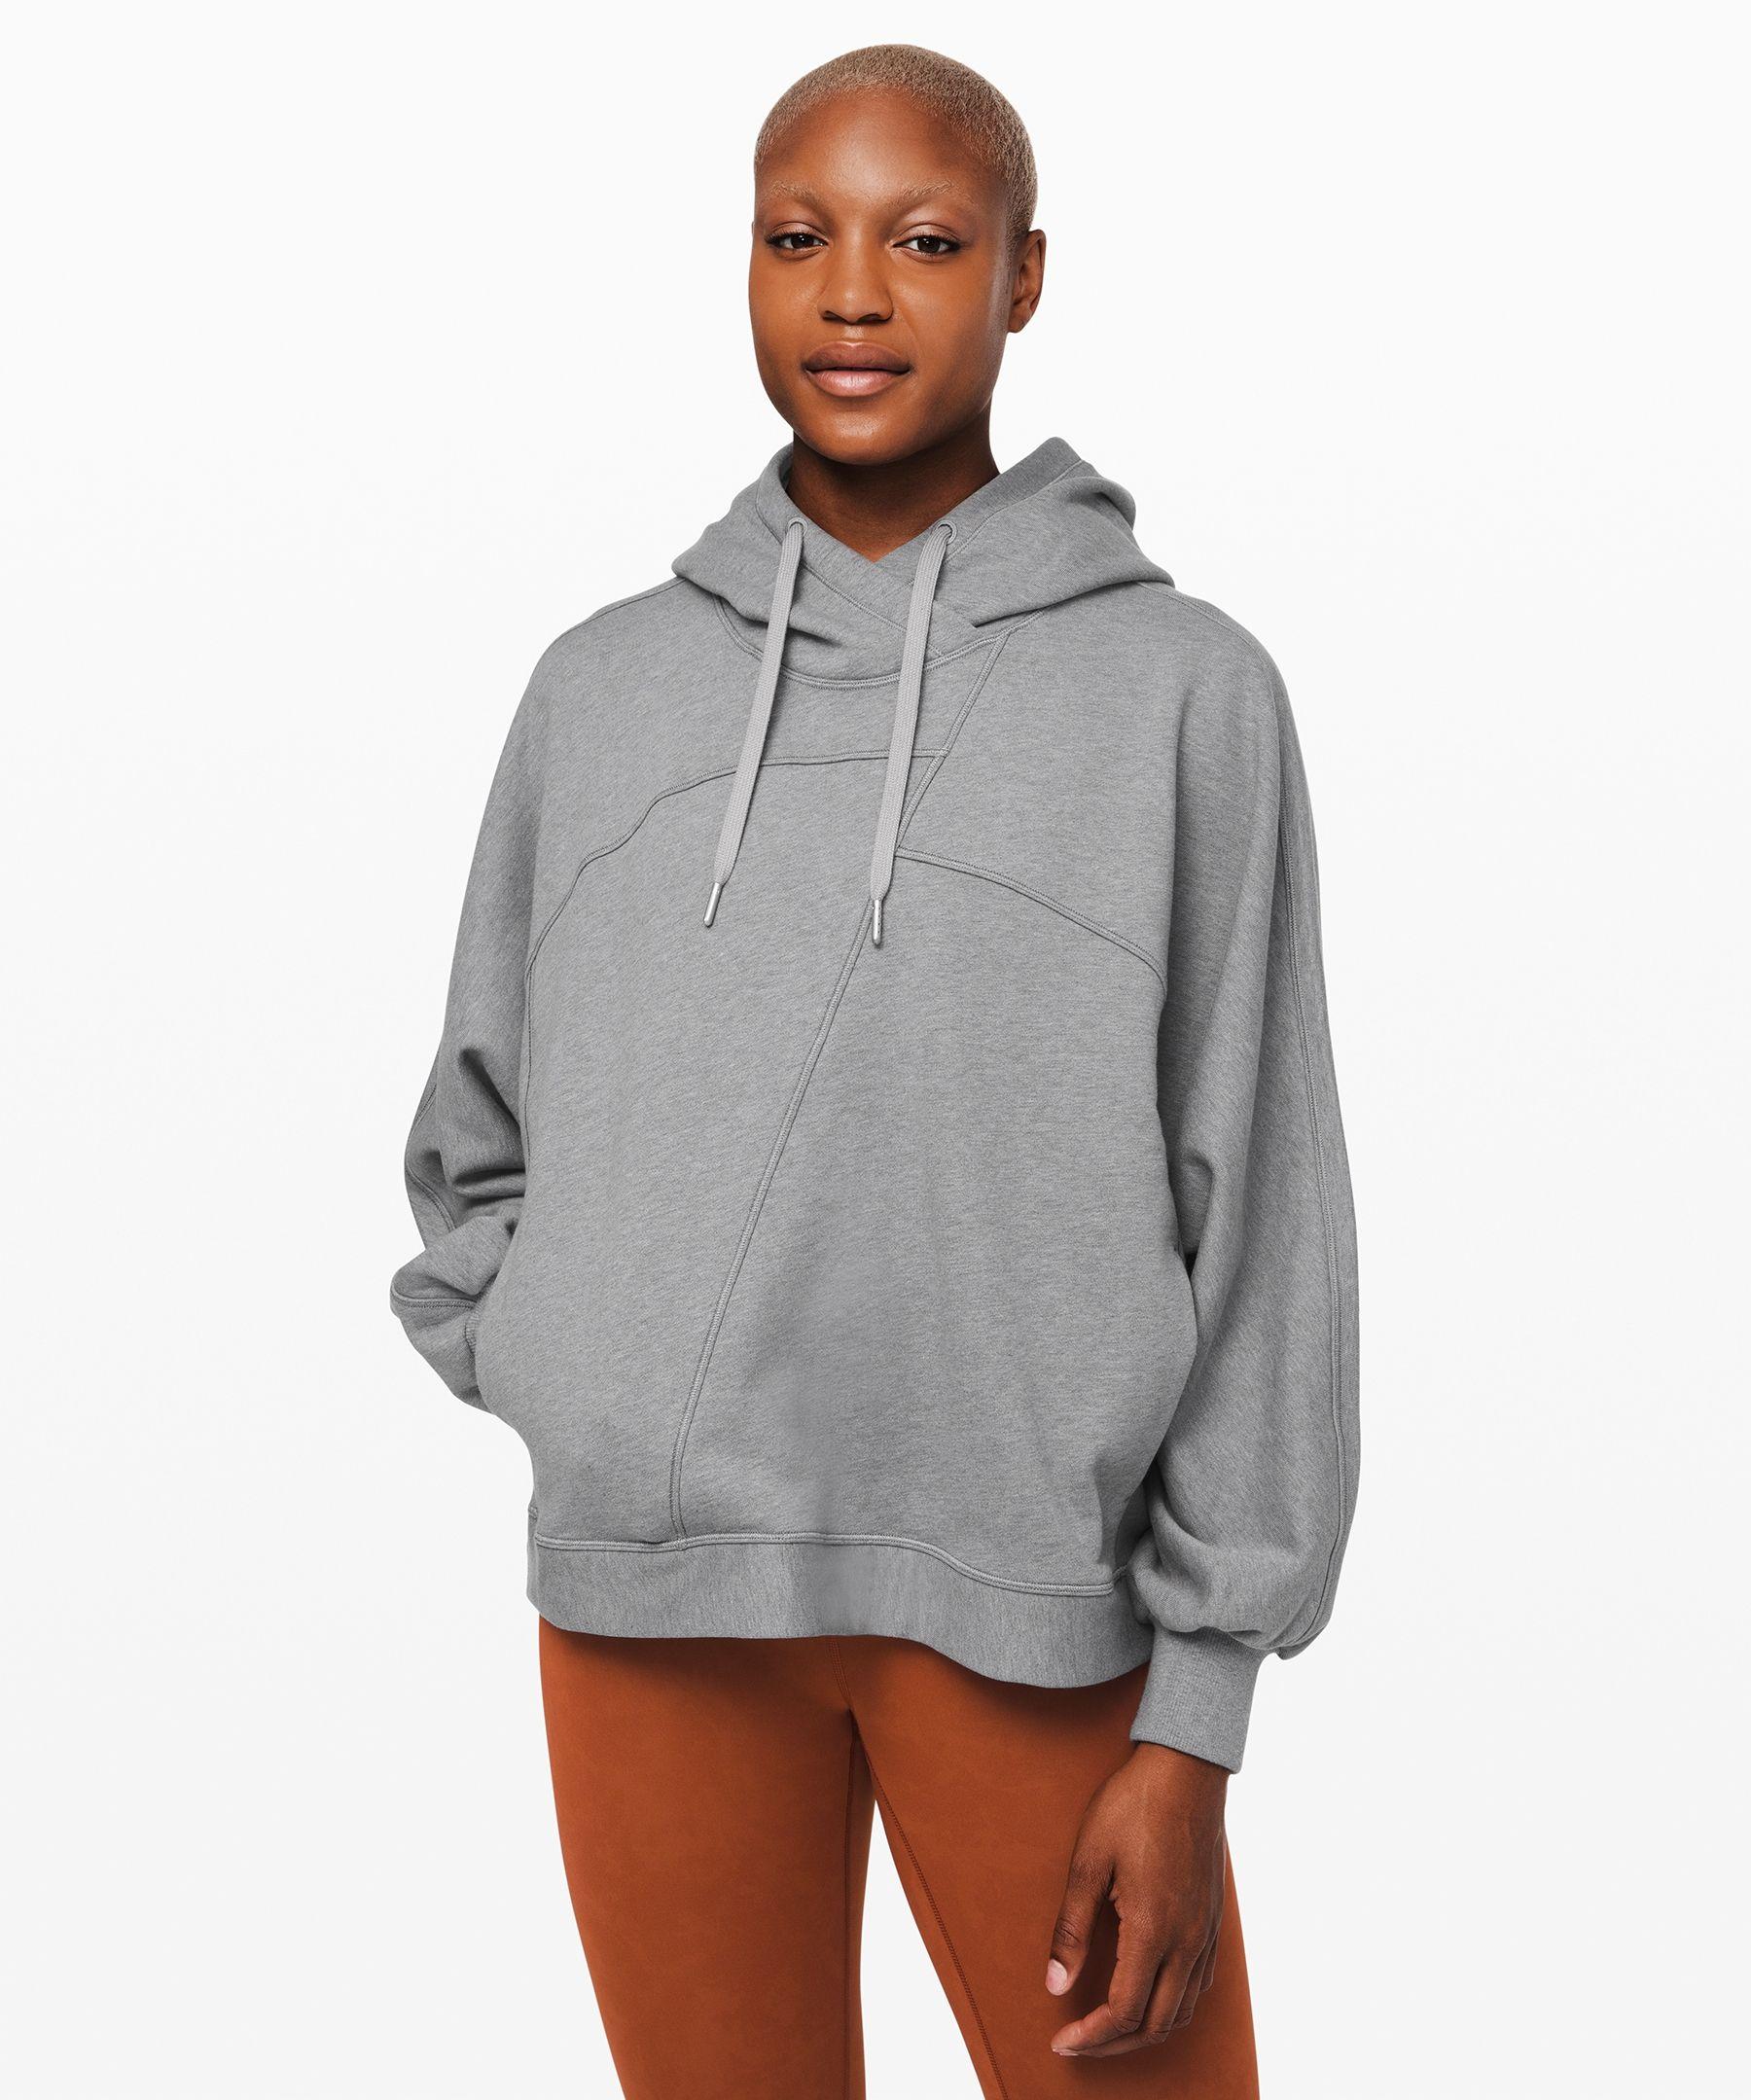 Lululemon Broken Beats Hoodie Lululemon Cloth Women Hoodies Sweatshirts Hoodies Hoodies Womens [ 2159 x 1800 Pixel ]